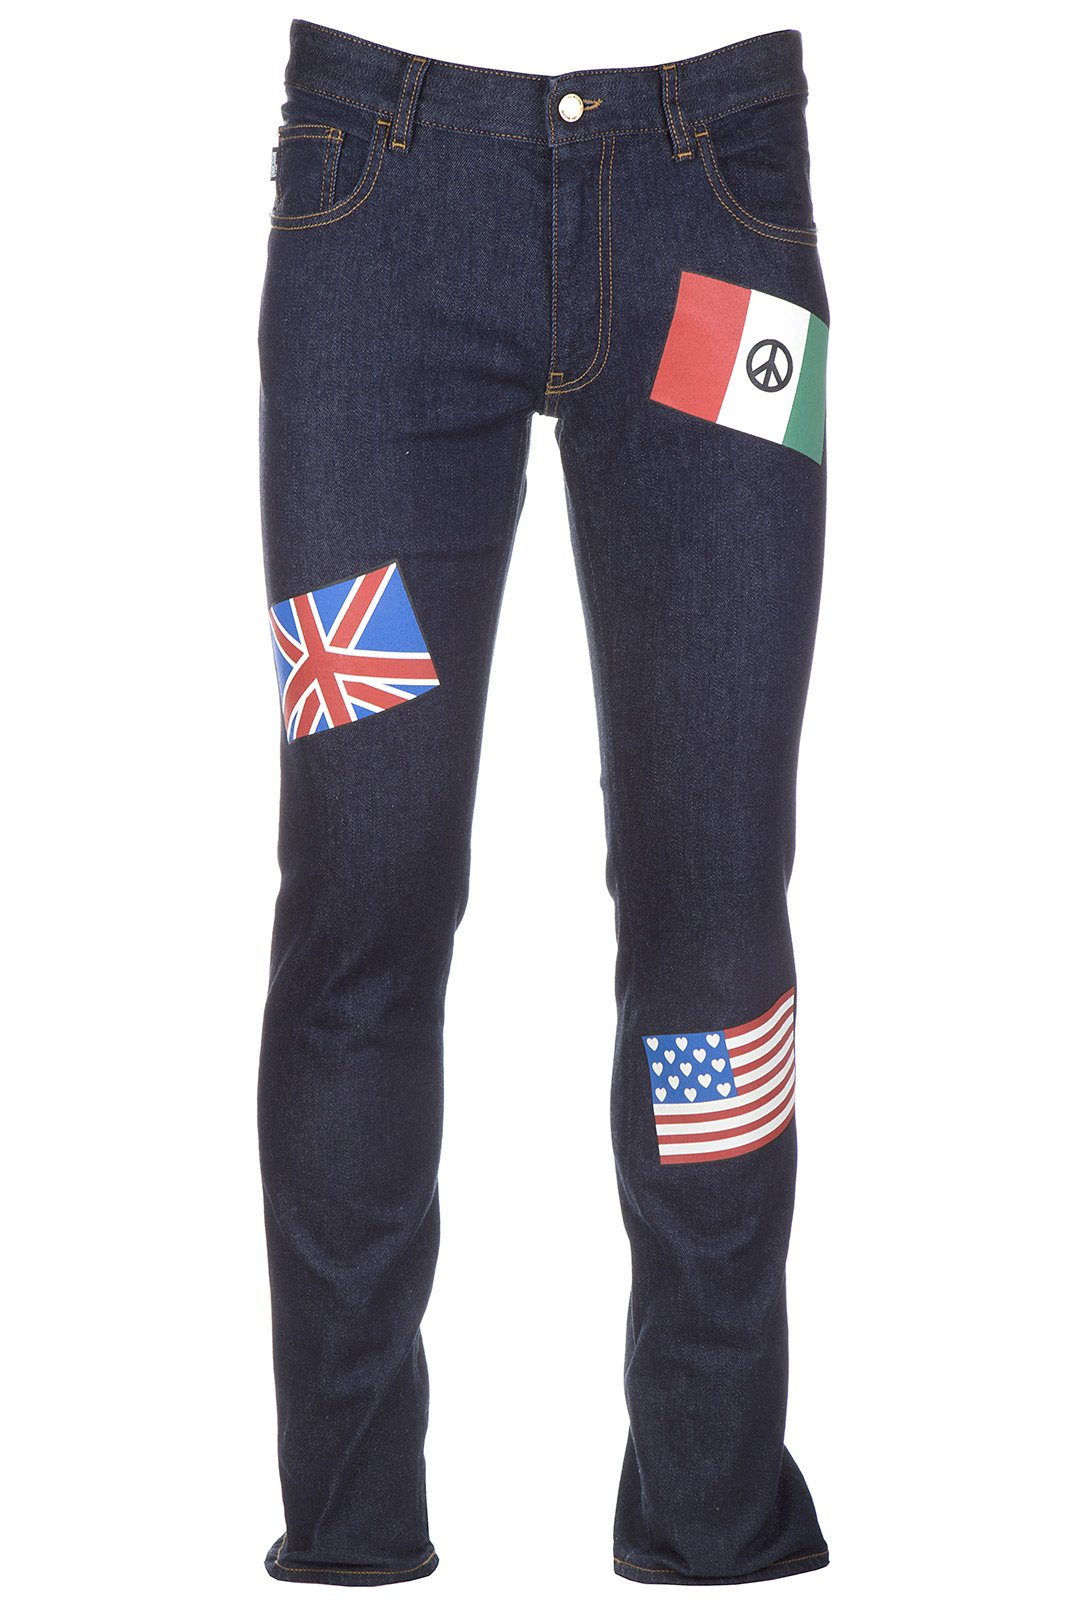 Love Moschino Men's Jeans Denim Blu US Size 32 (US 32) M Q 428 03 S 2762 00